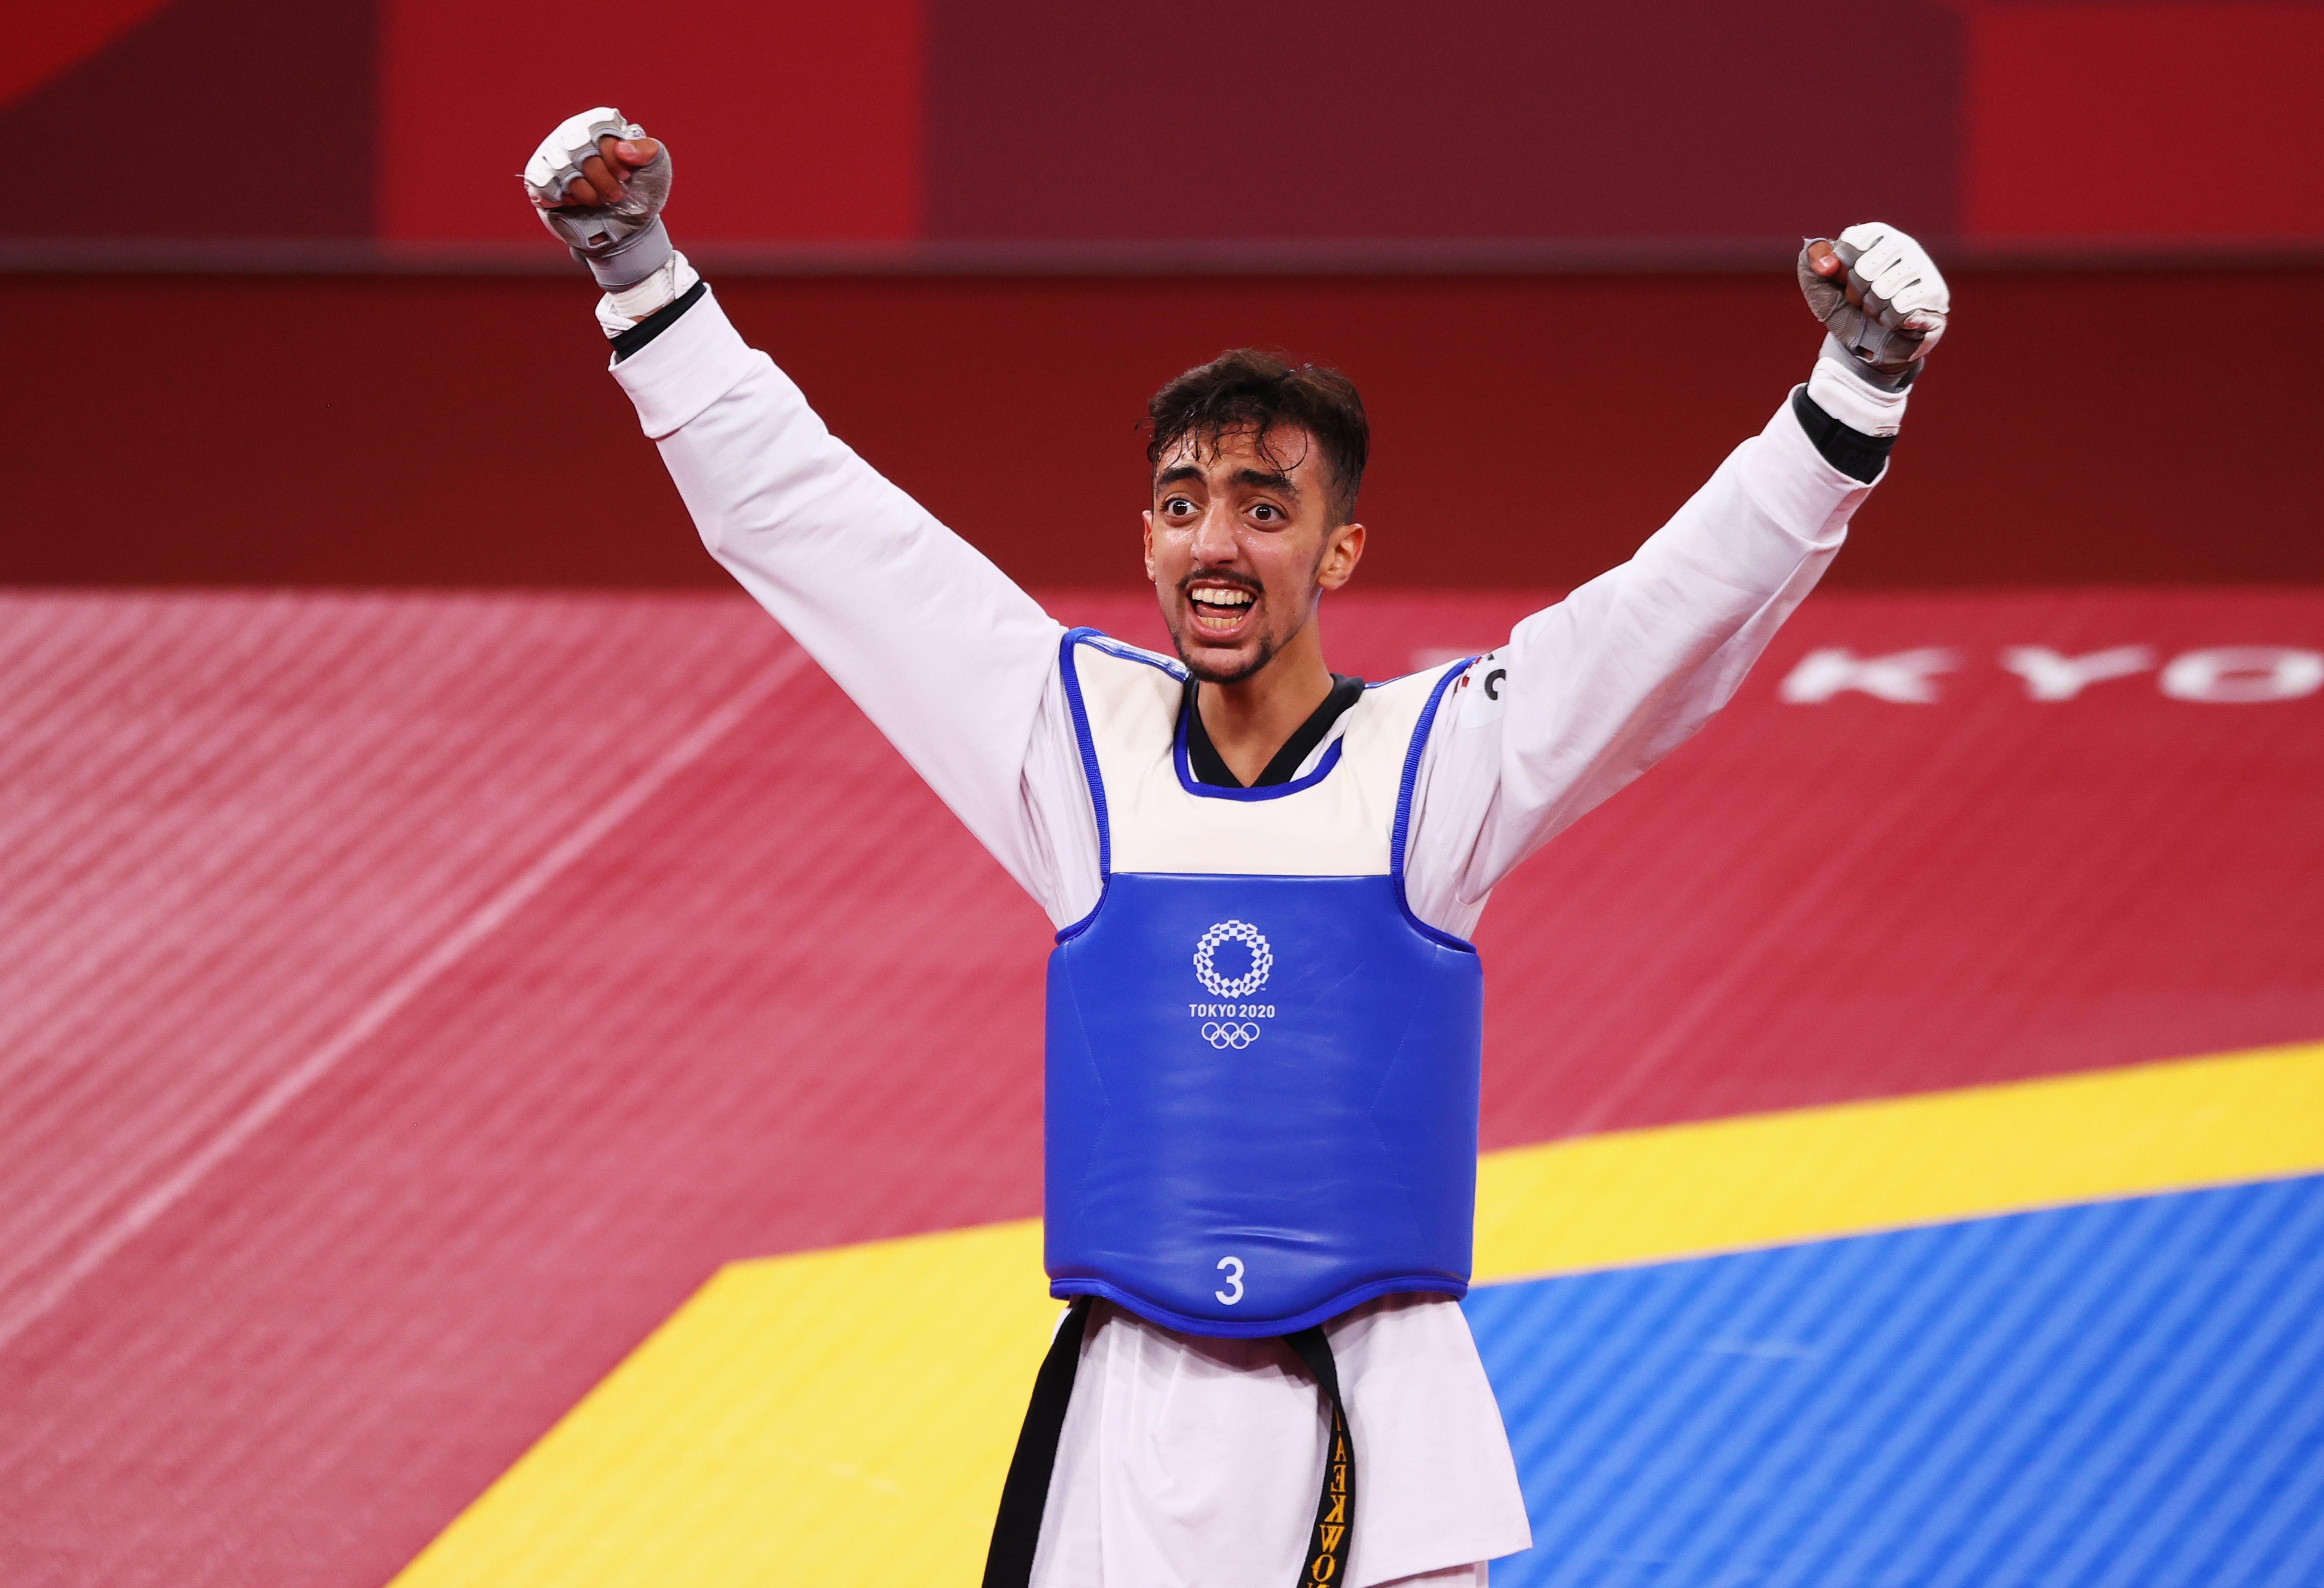 Tokyo 2020 Olympics - Taekwondo - Men's Flyweight - 58kg - Semifinal - Makuhari Messe Hall A, Chiba, Japan - July 24, 2021. Mohamed Khalil Jendoubi of Tunisia celebrates after competing REUTERS/Murad Sezer